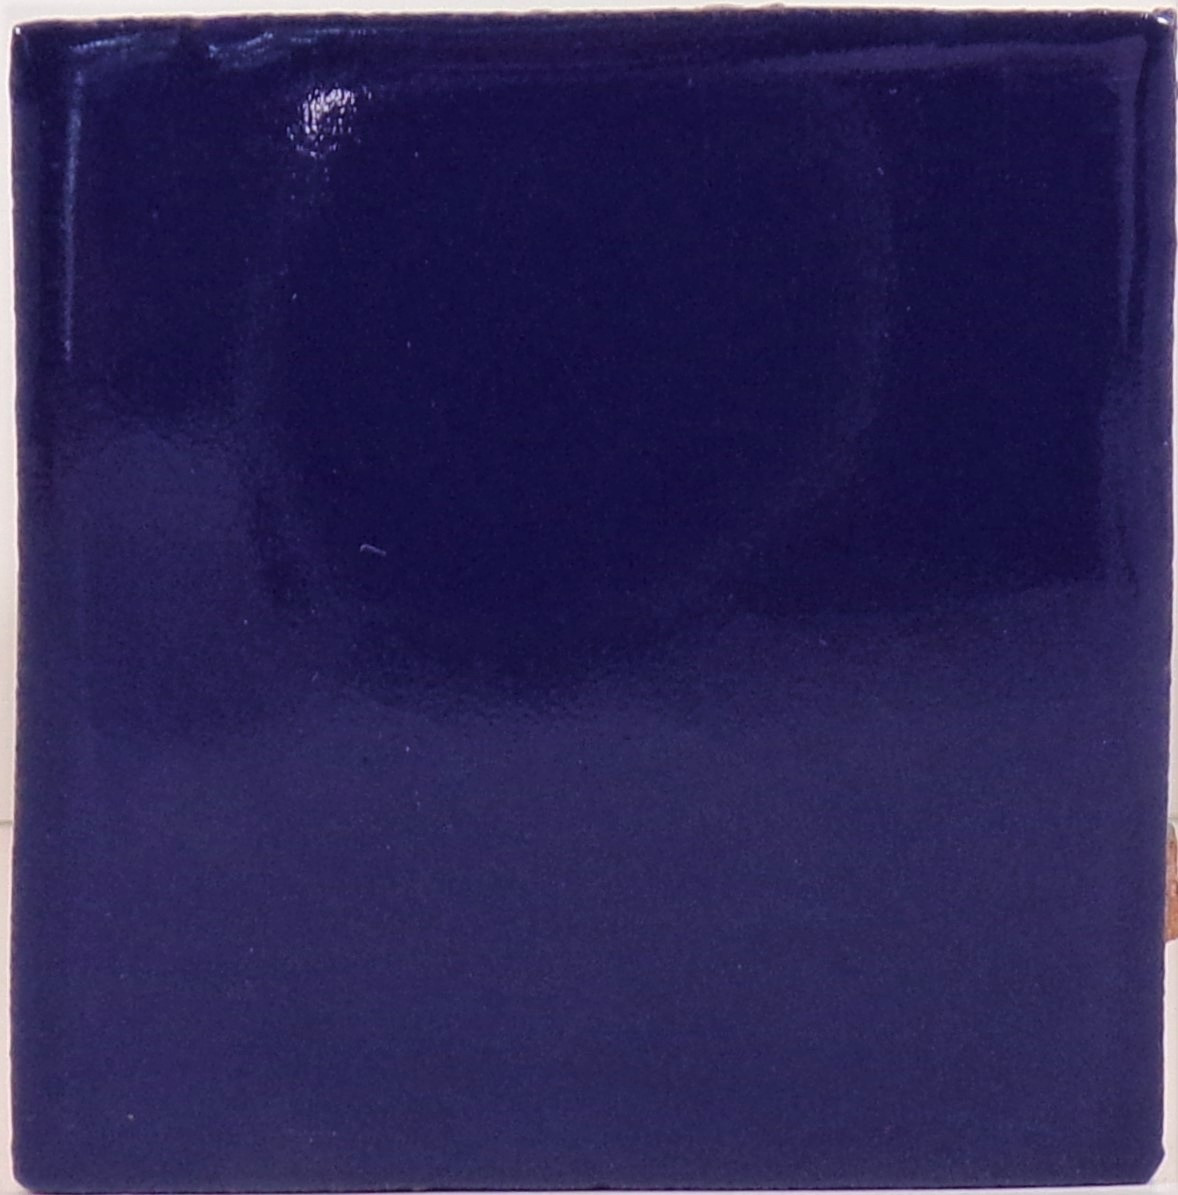 Blue 2x2